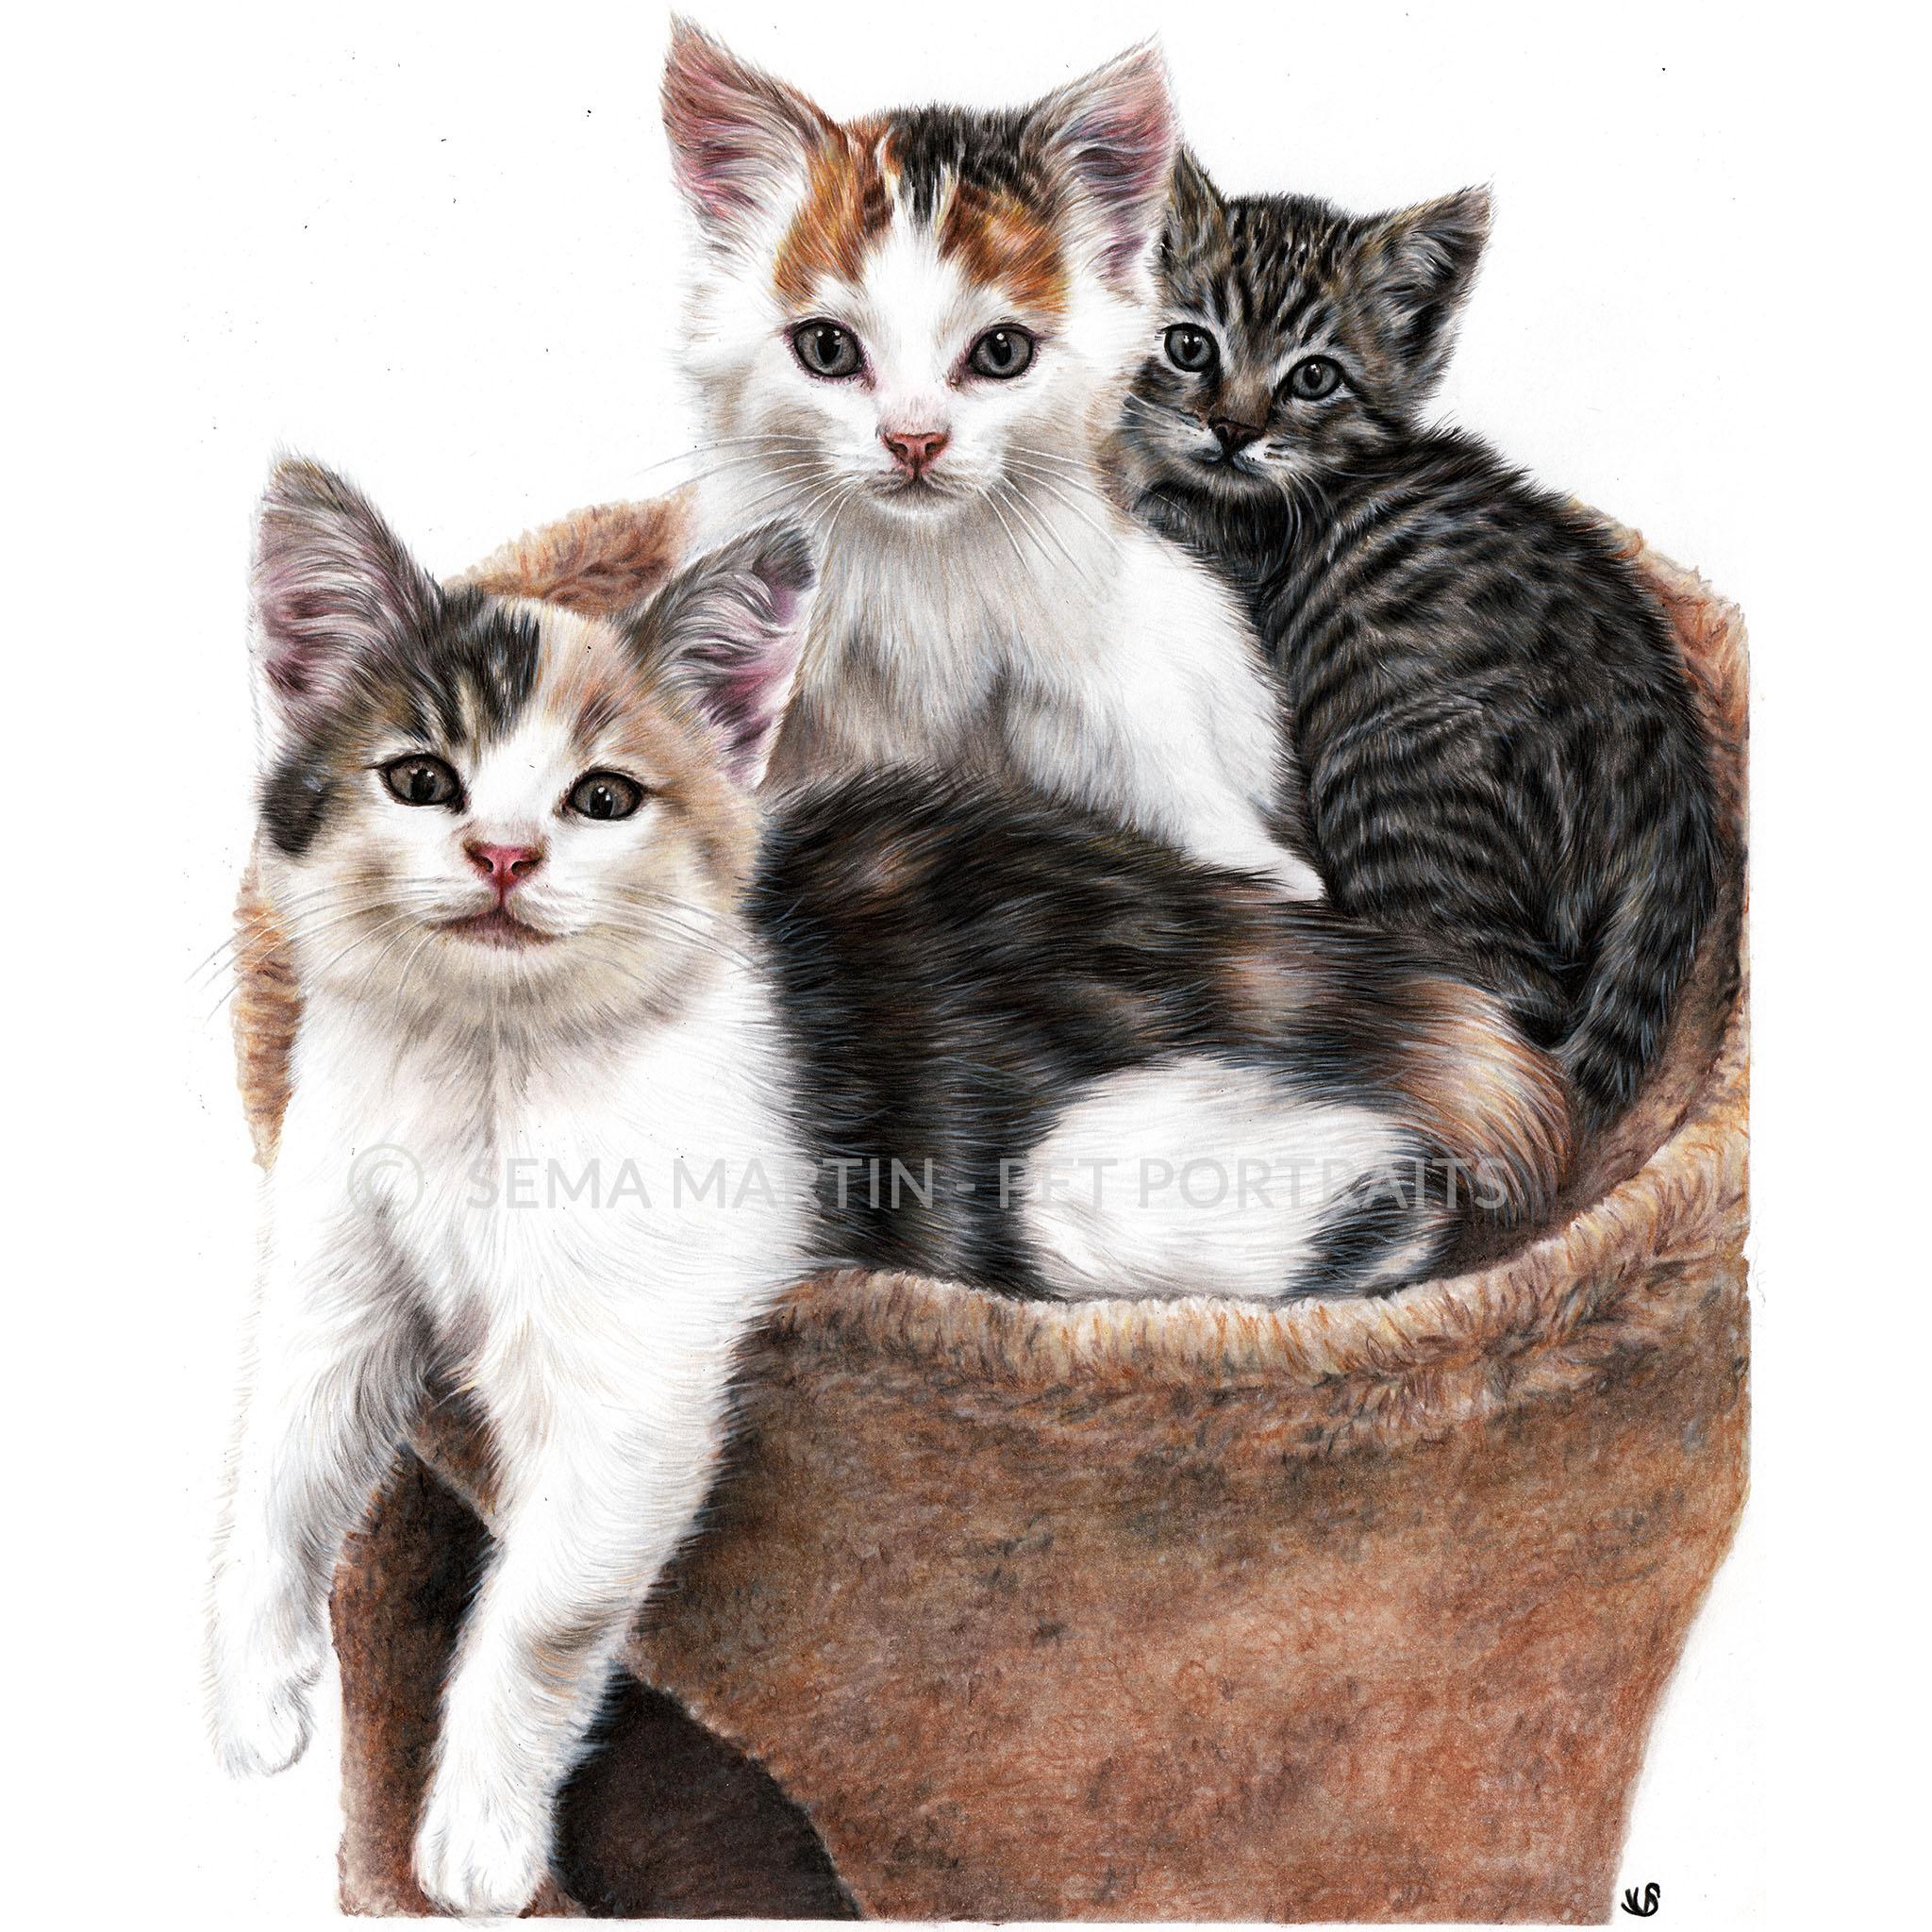 'Kai, Keikoa & LeiLani' - USA, 11.7 x 16.5 inches, 2019, Colored pencil portrait of three kittens